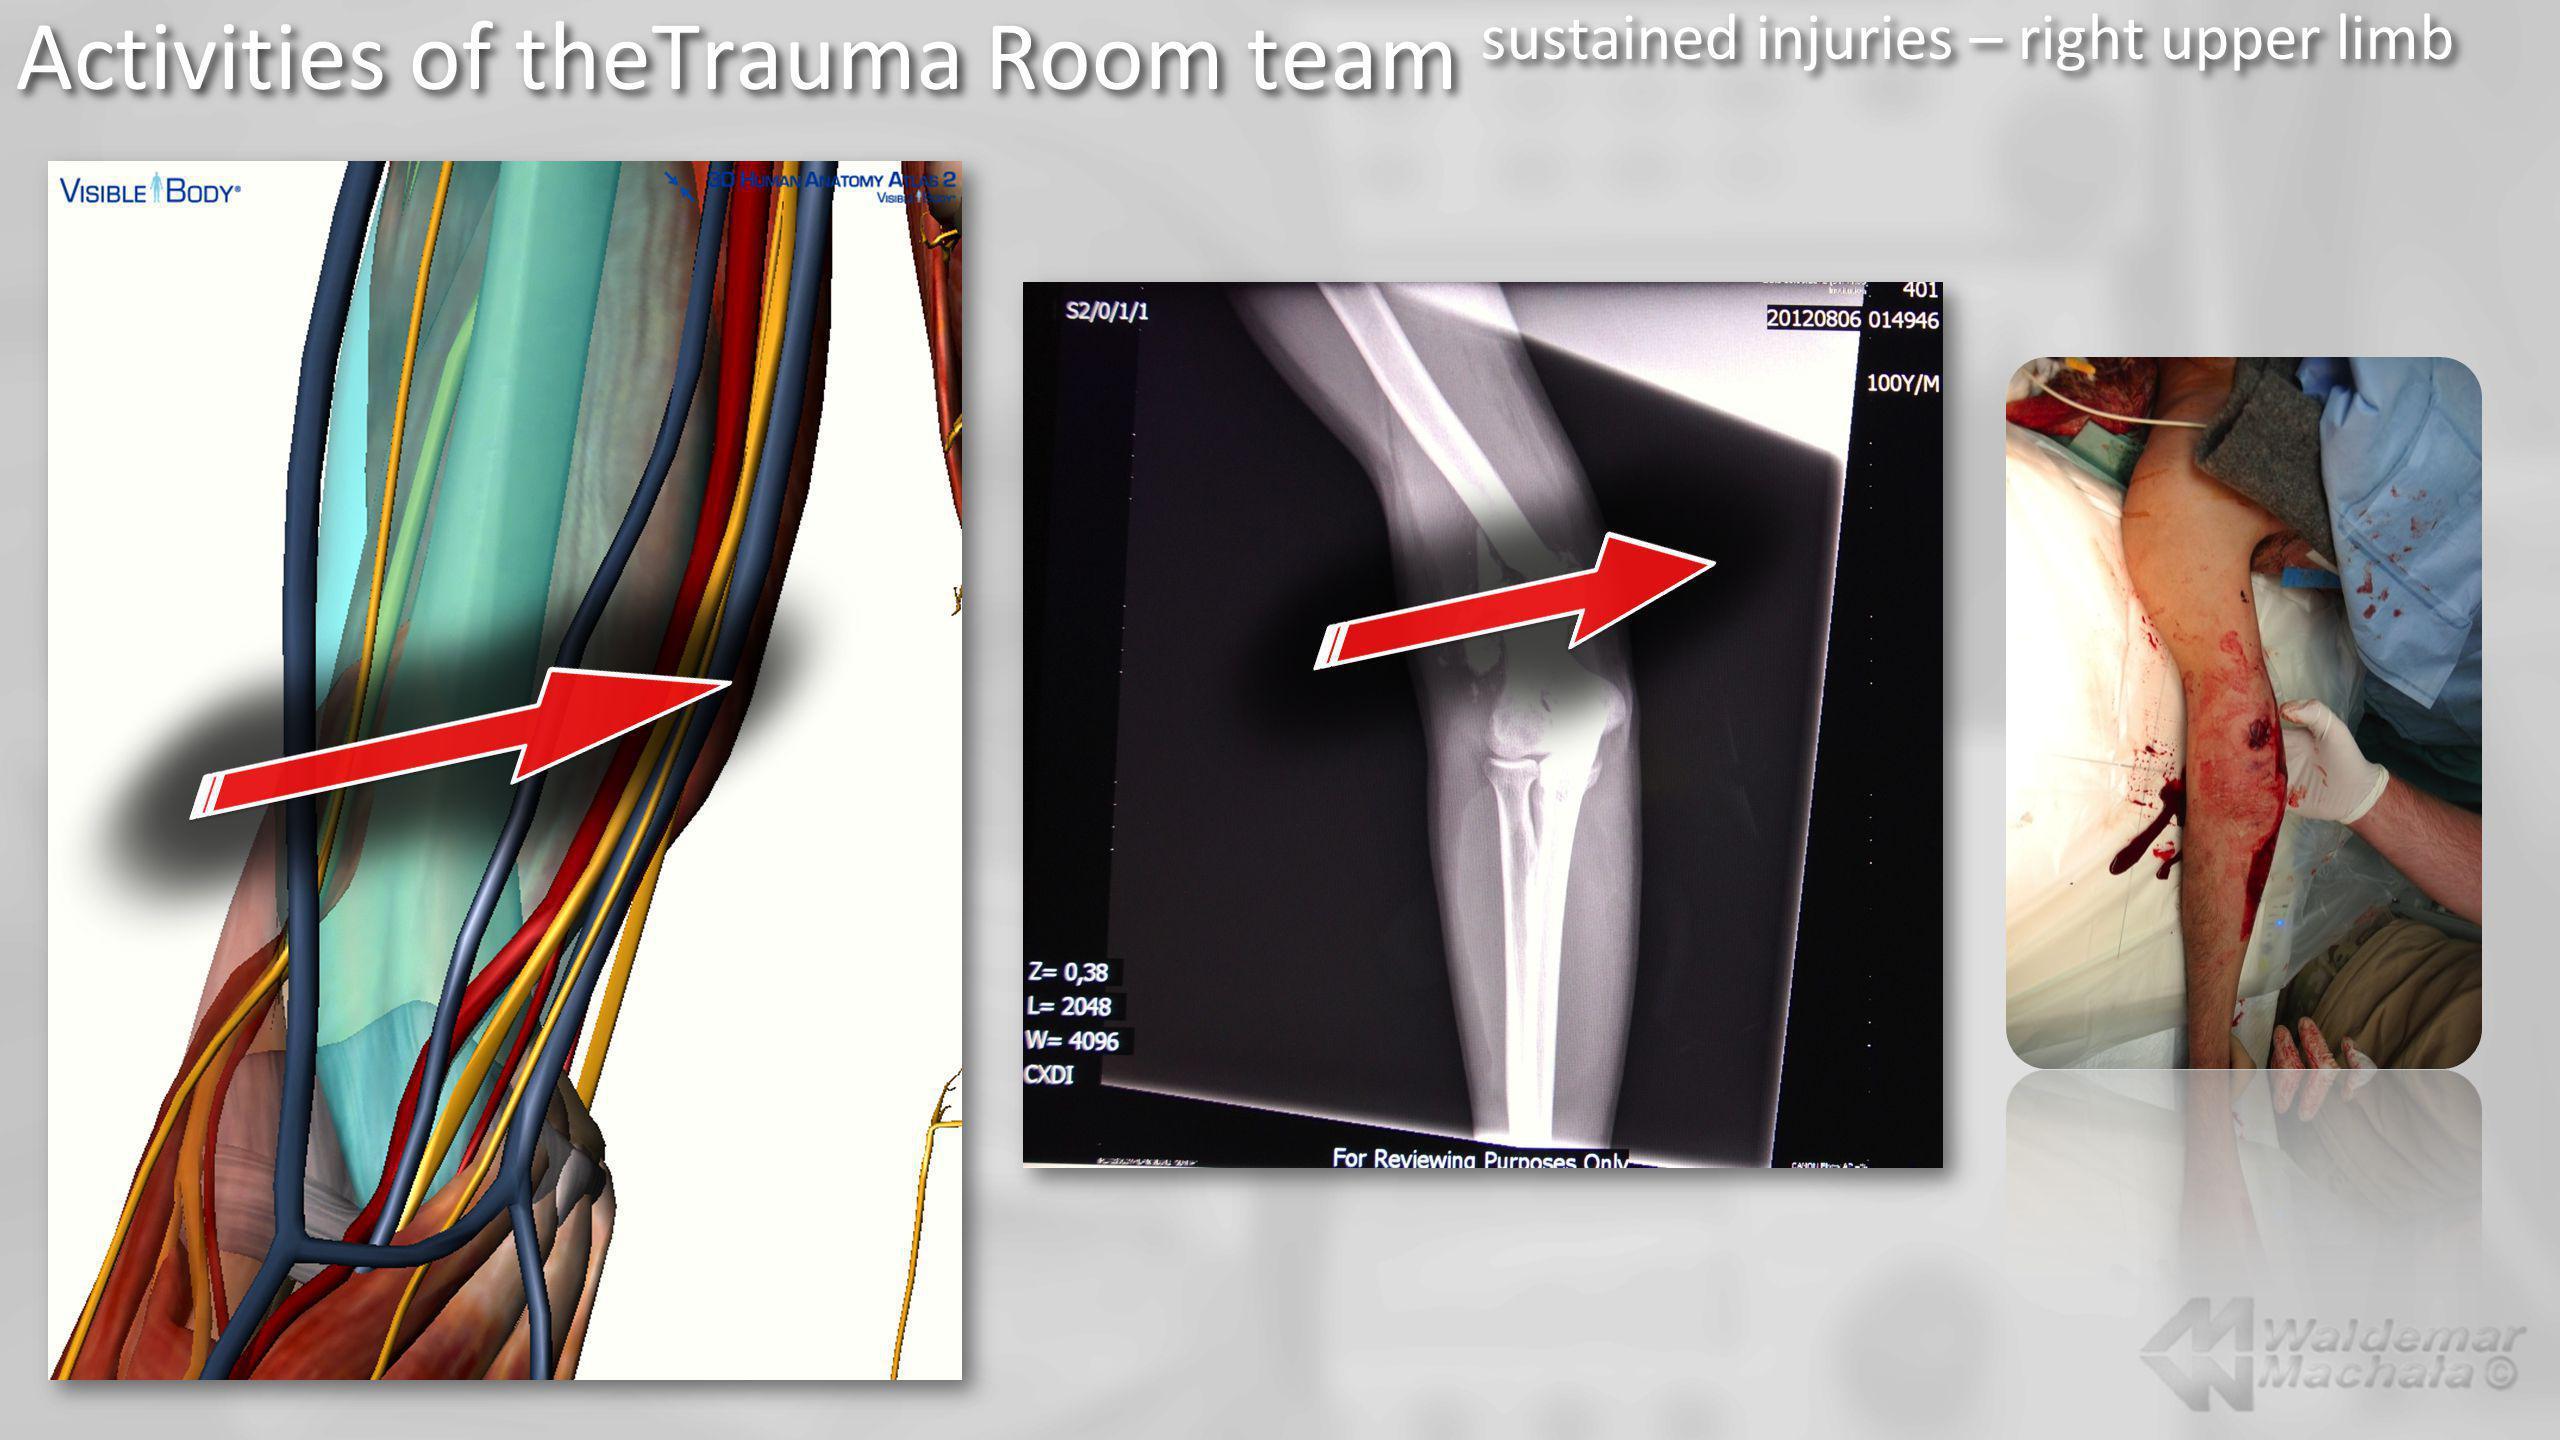 Activities of theTrauma Room team sustained injuries – right upper limb